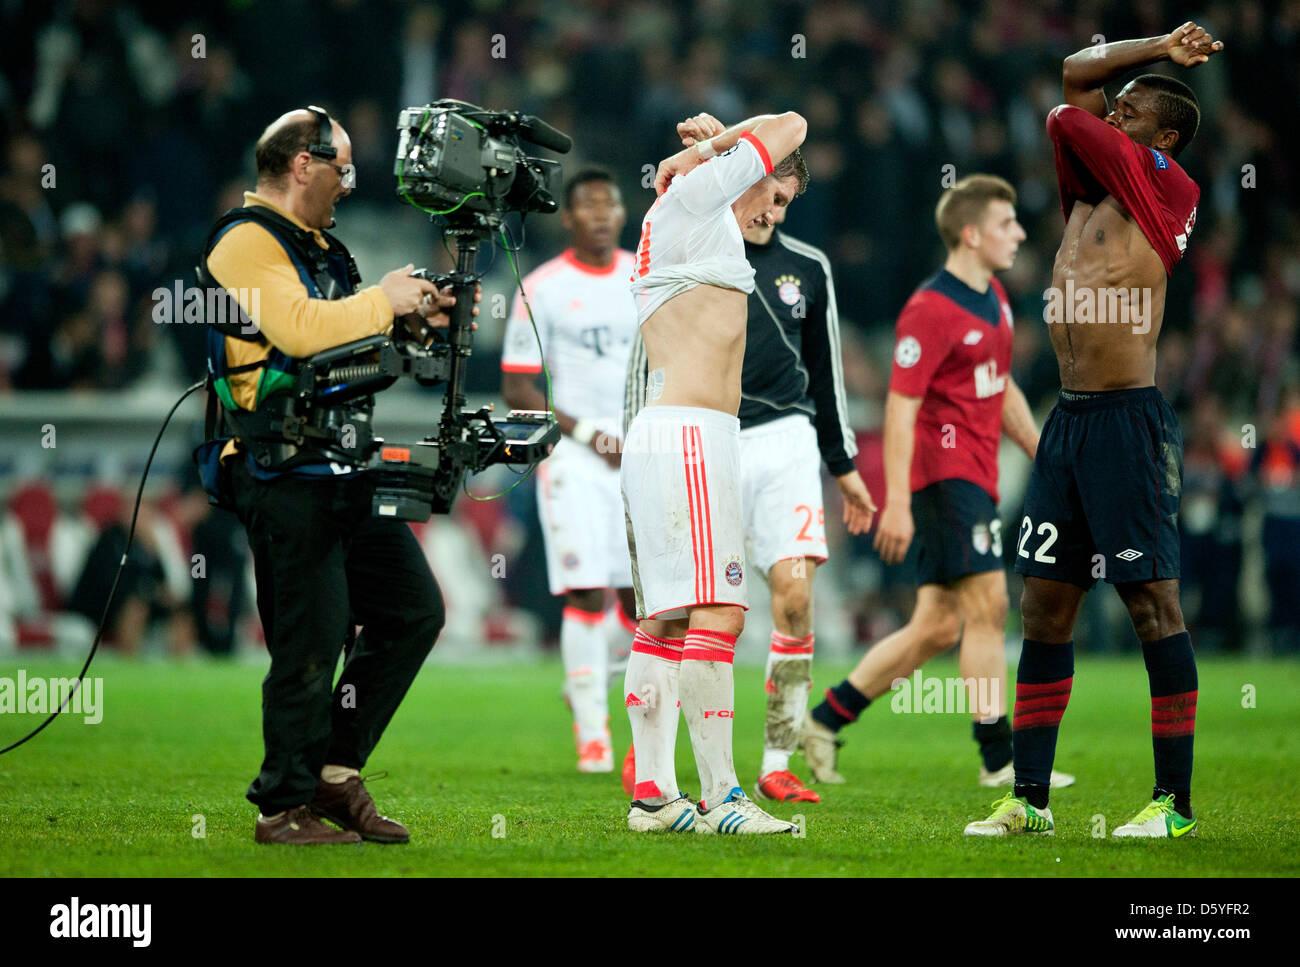 Munich's Munich's Bastian Schweinsteiger (L) and Lille's Aurélien Chedjou change their trikots - Stock Image